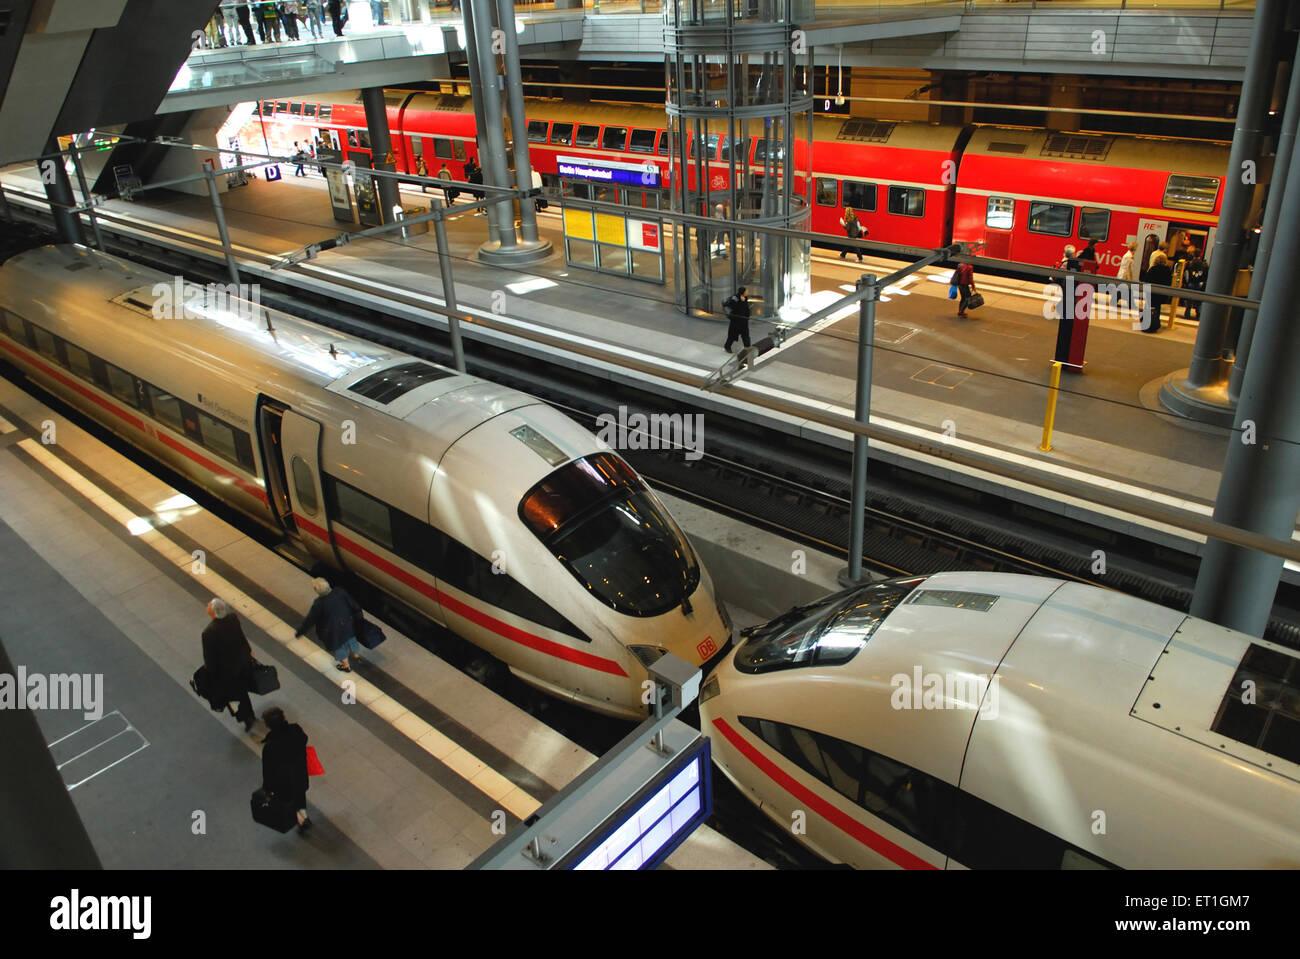 Tgv trains at station ; Germany - Stock Image